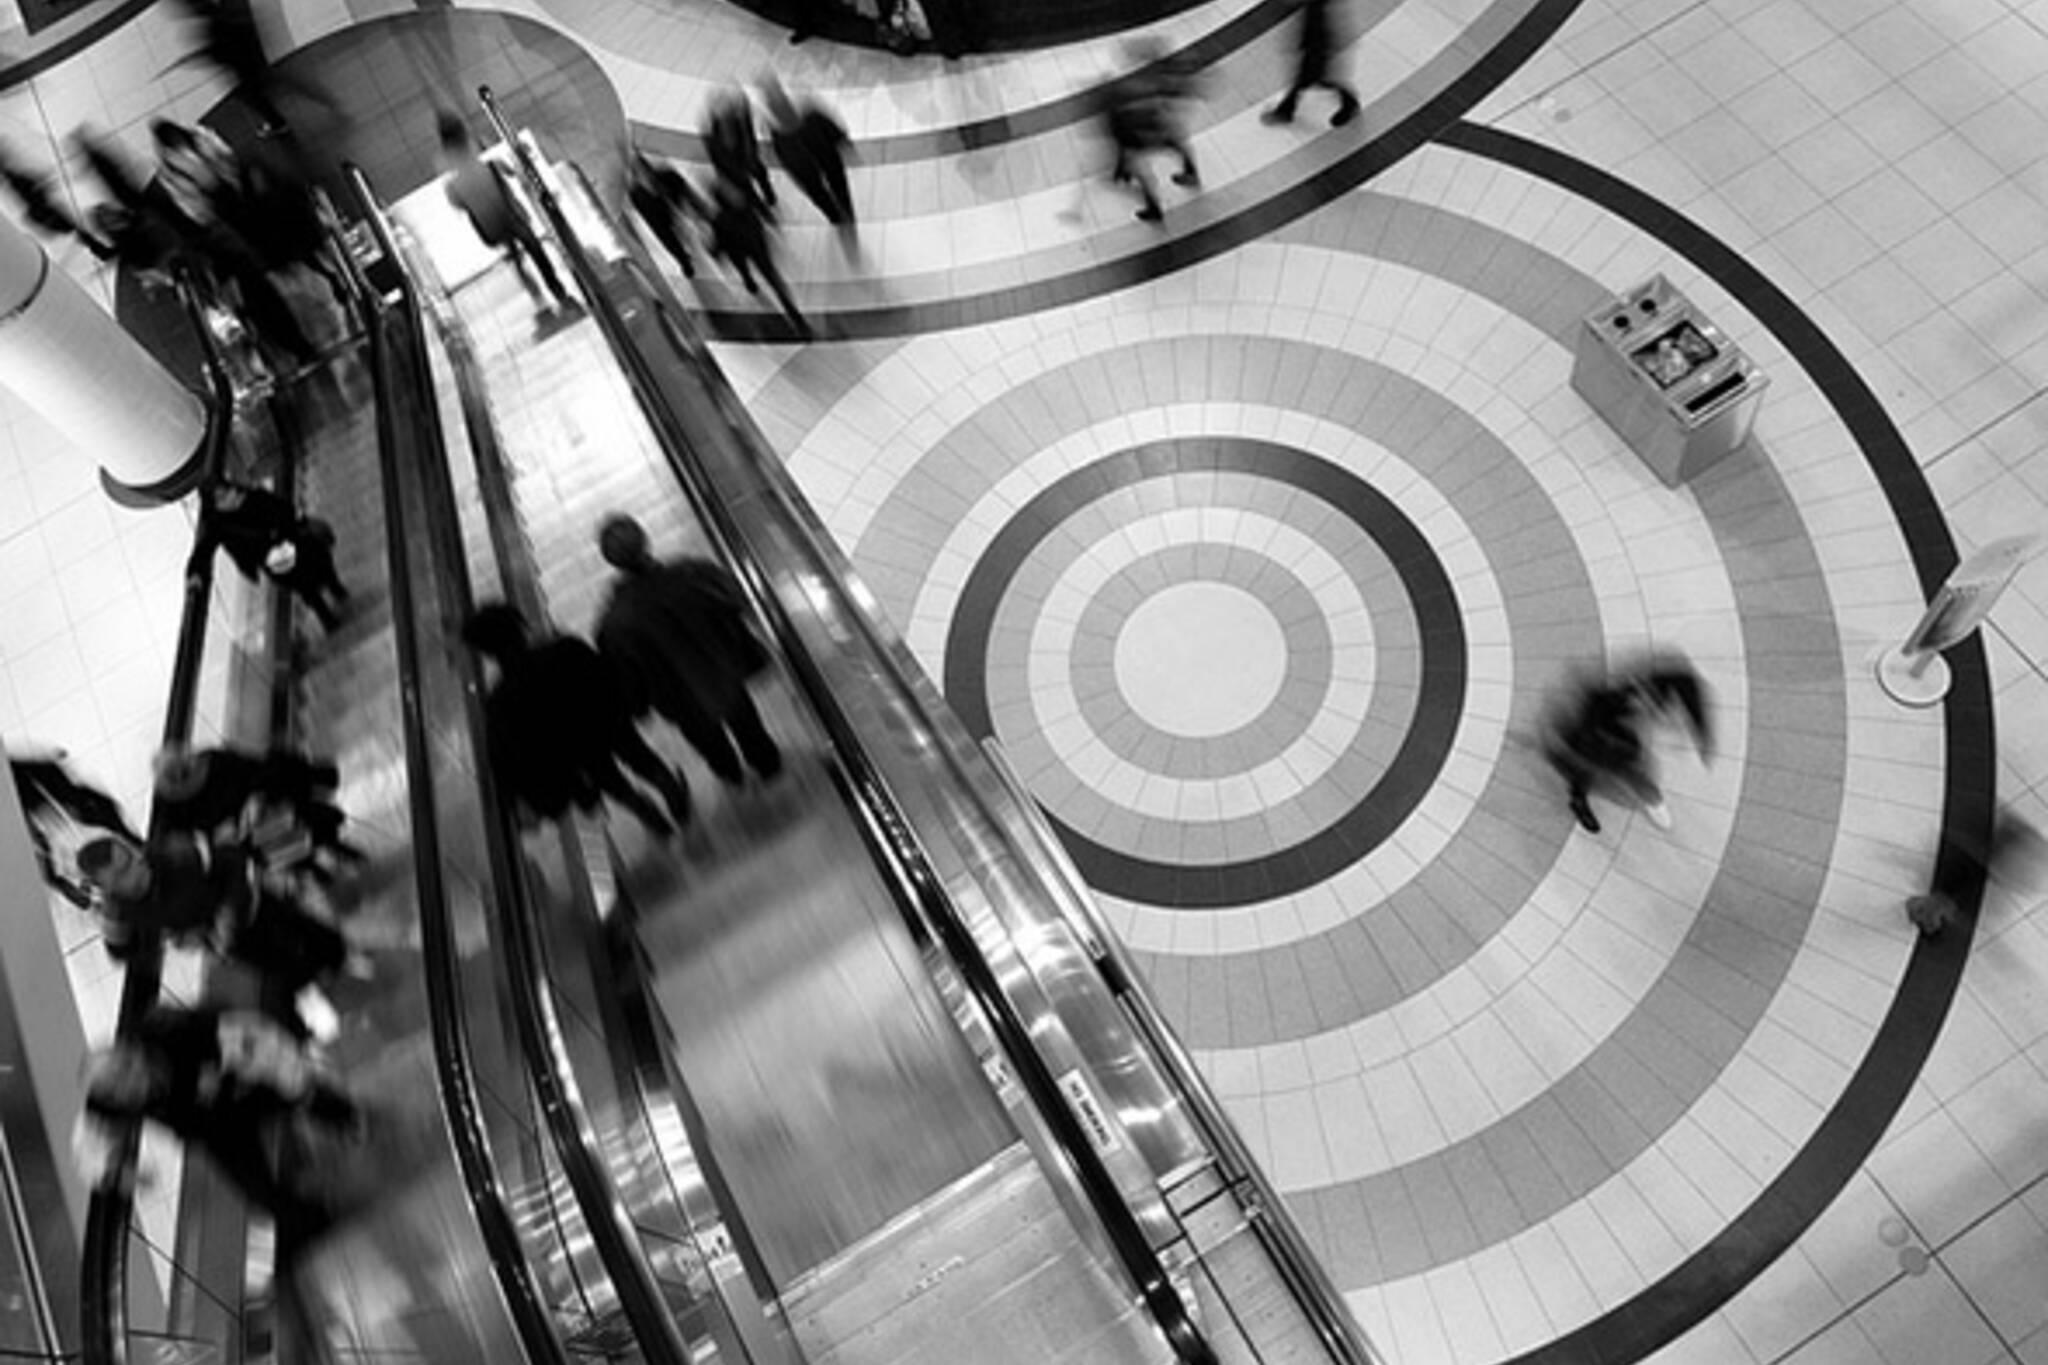 eatons, centre, shoppers